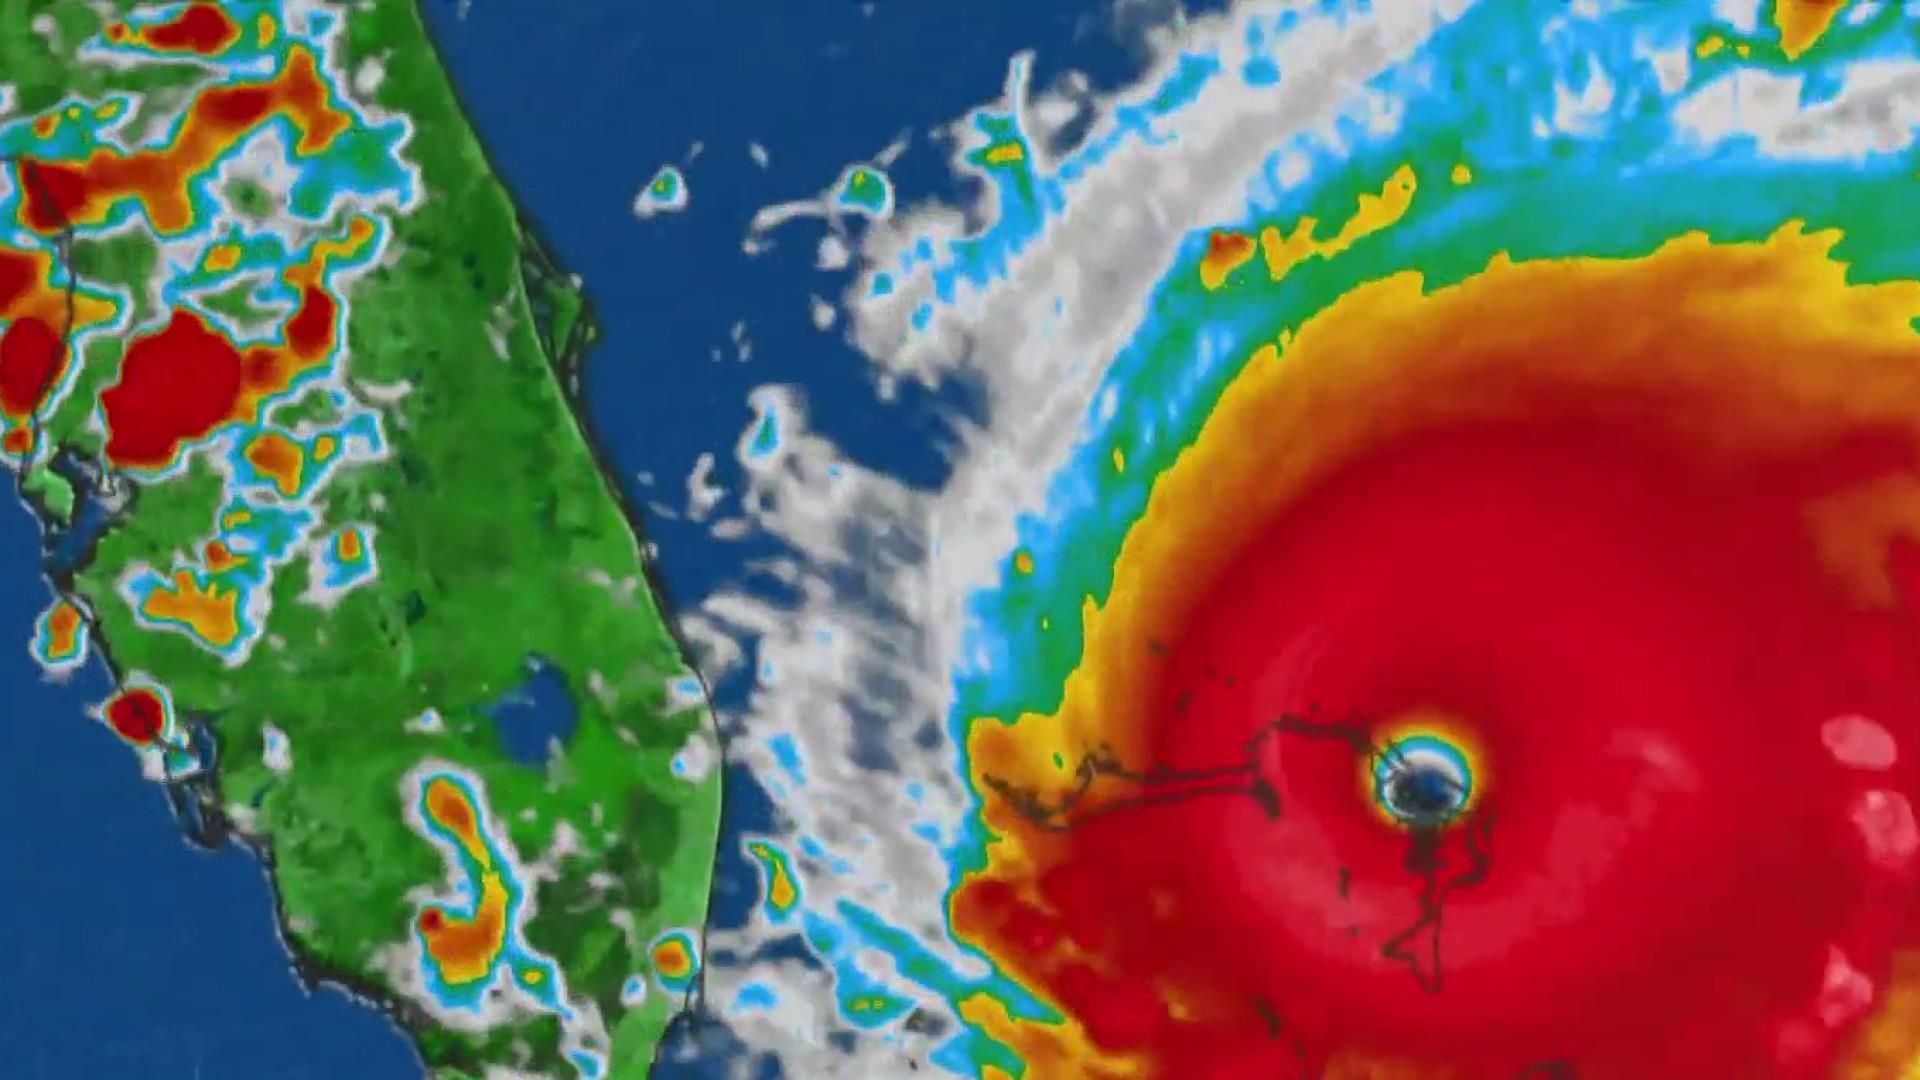 Mandatory evacuations ordered in Florida after Hurricane Dorian batters the Bahamas